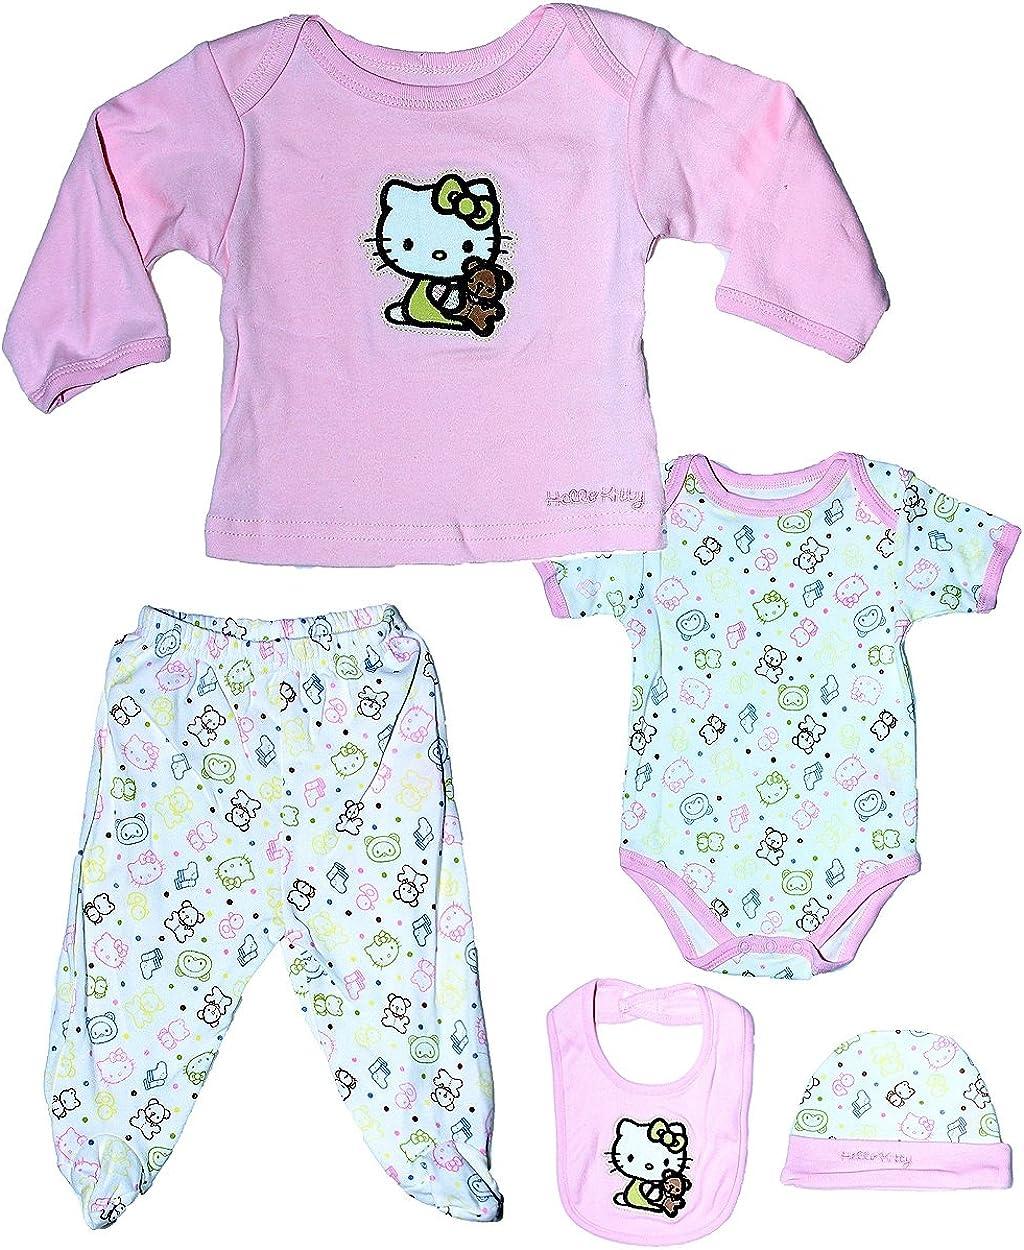 Hello Kitty Baby Girls Newborn Cotton Organics 5 Piece Gift Set